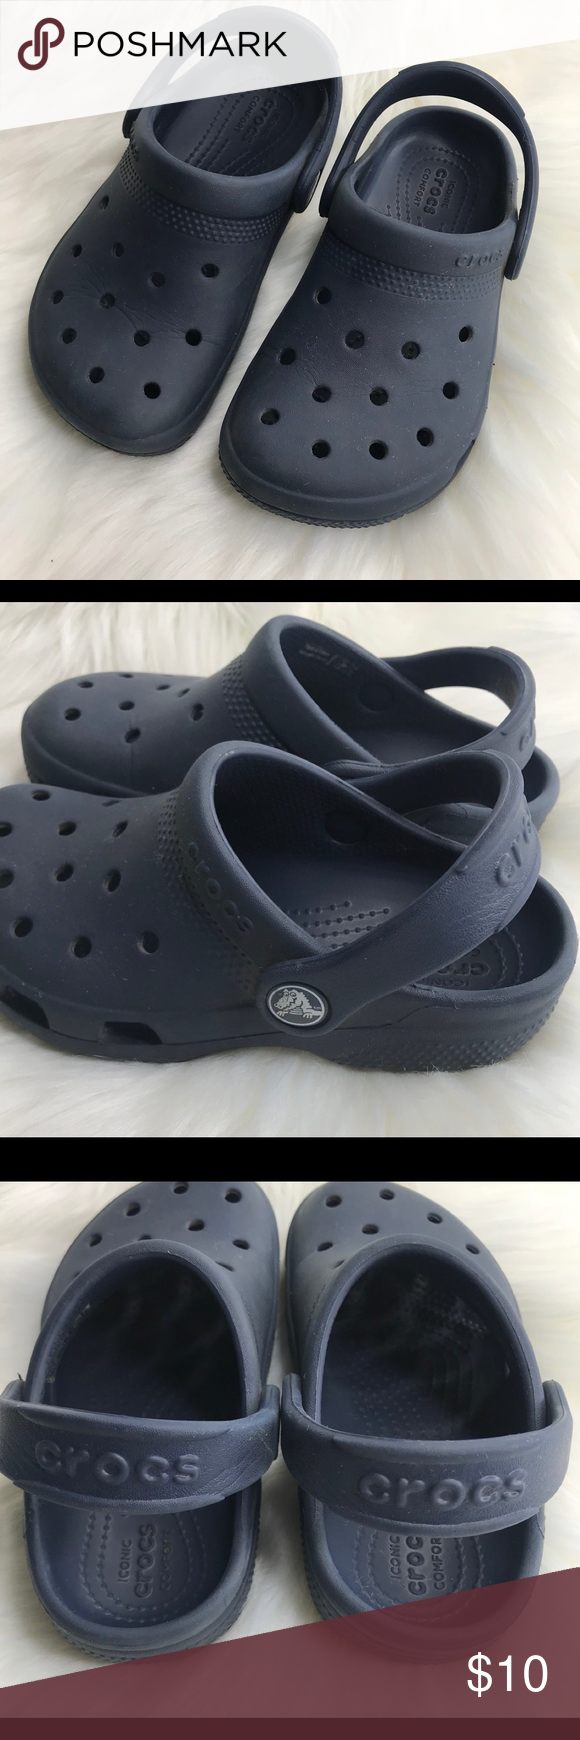 Kids Navy Crocs size 11. GUC | Crocs